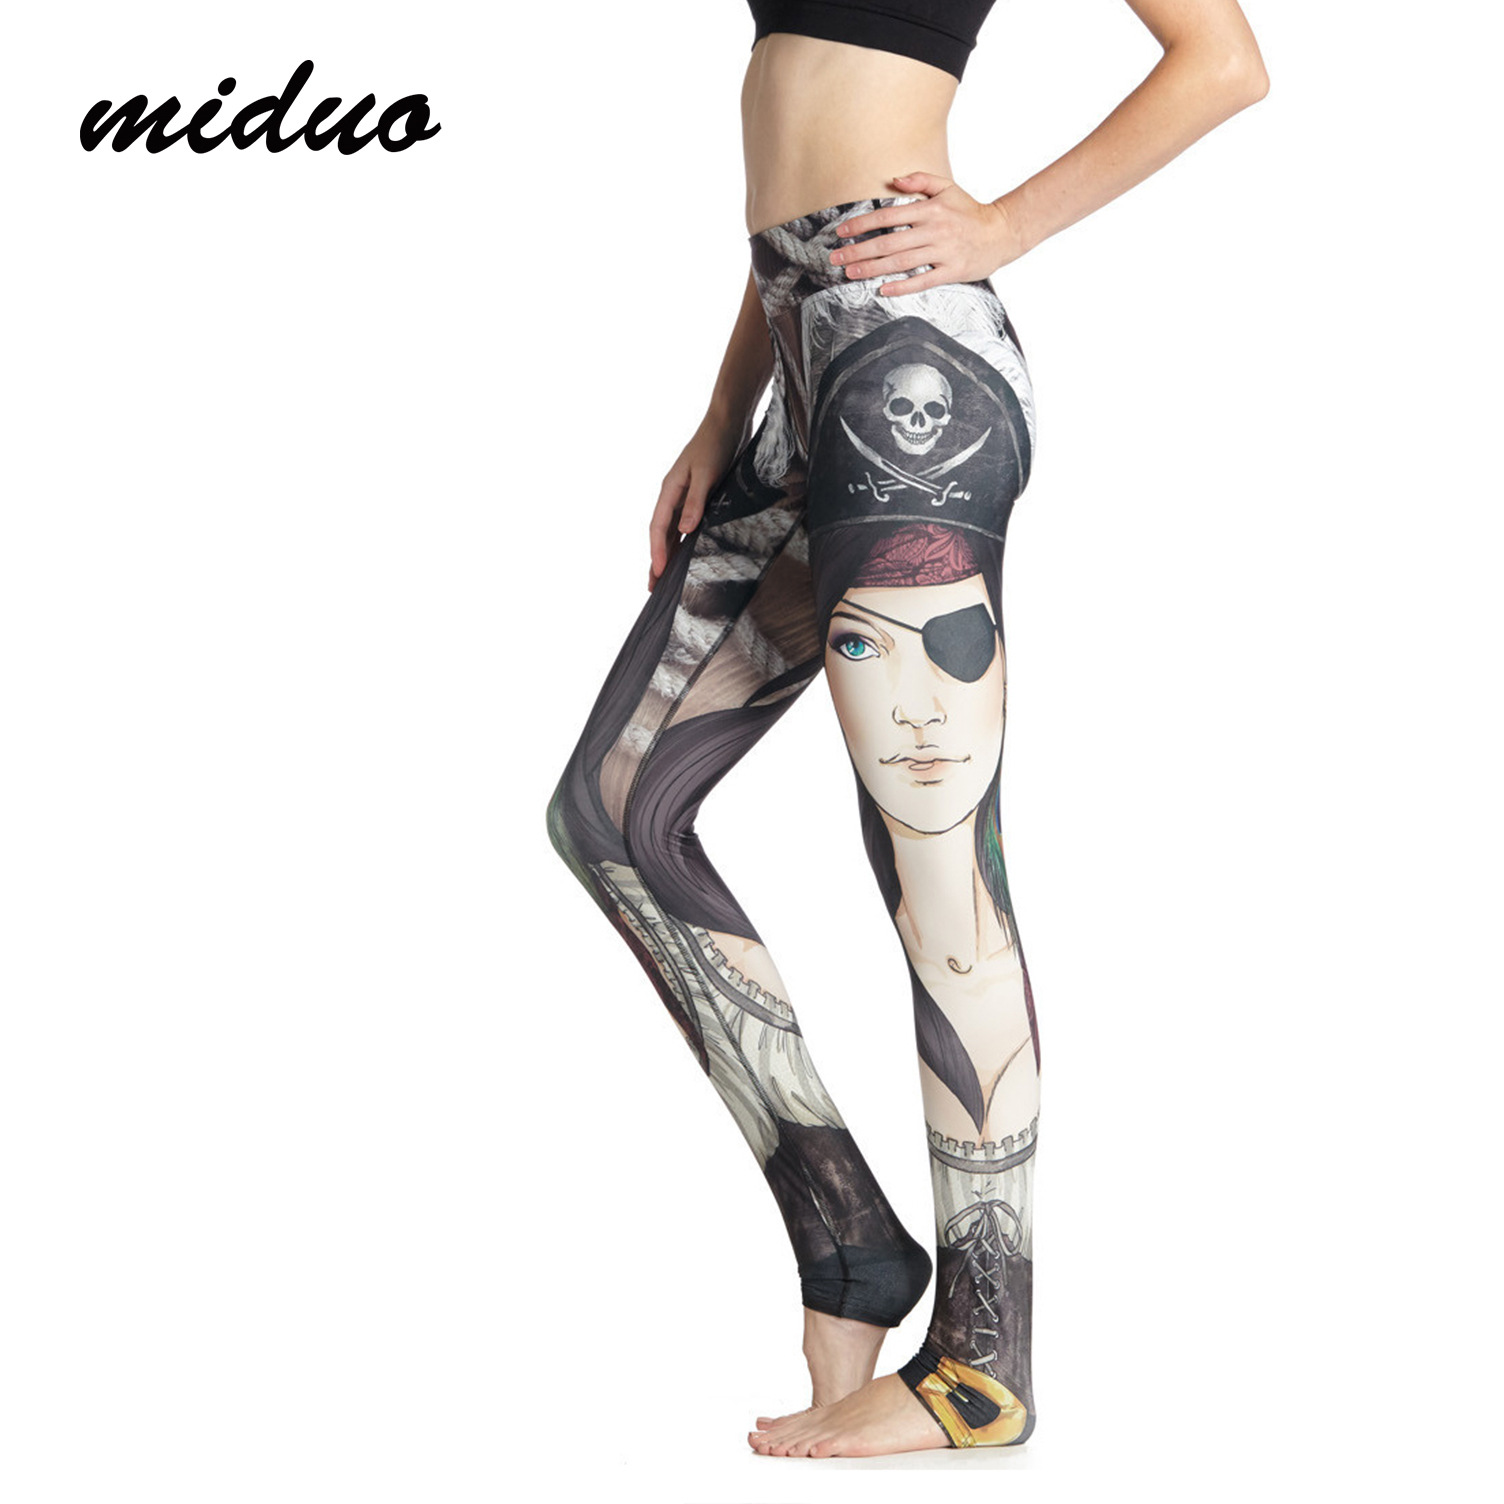 50802dbf1a leggins sport women fitness Pirate Printing High-end Yoga Leggings Stretch  Pants Skinny Gym Pants